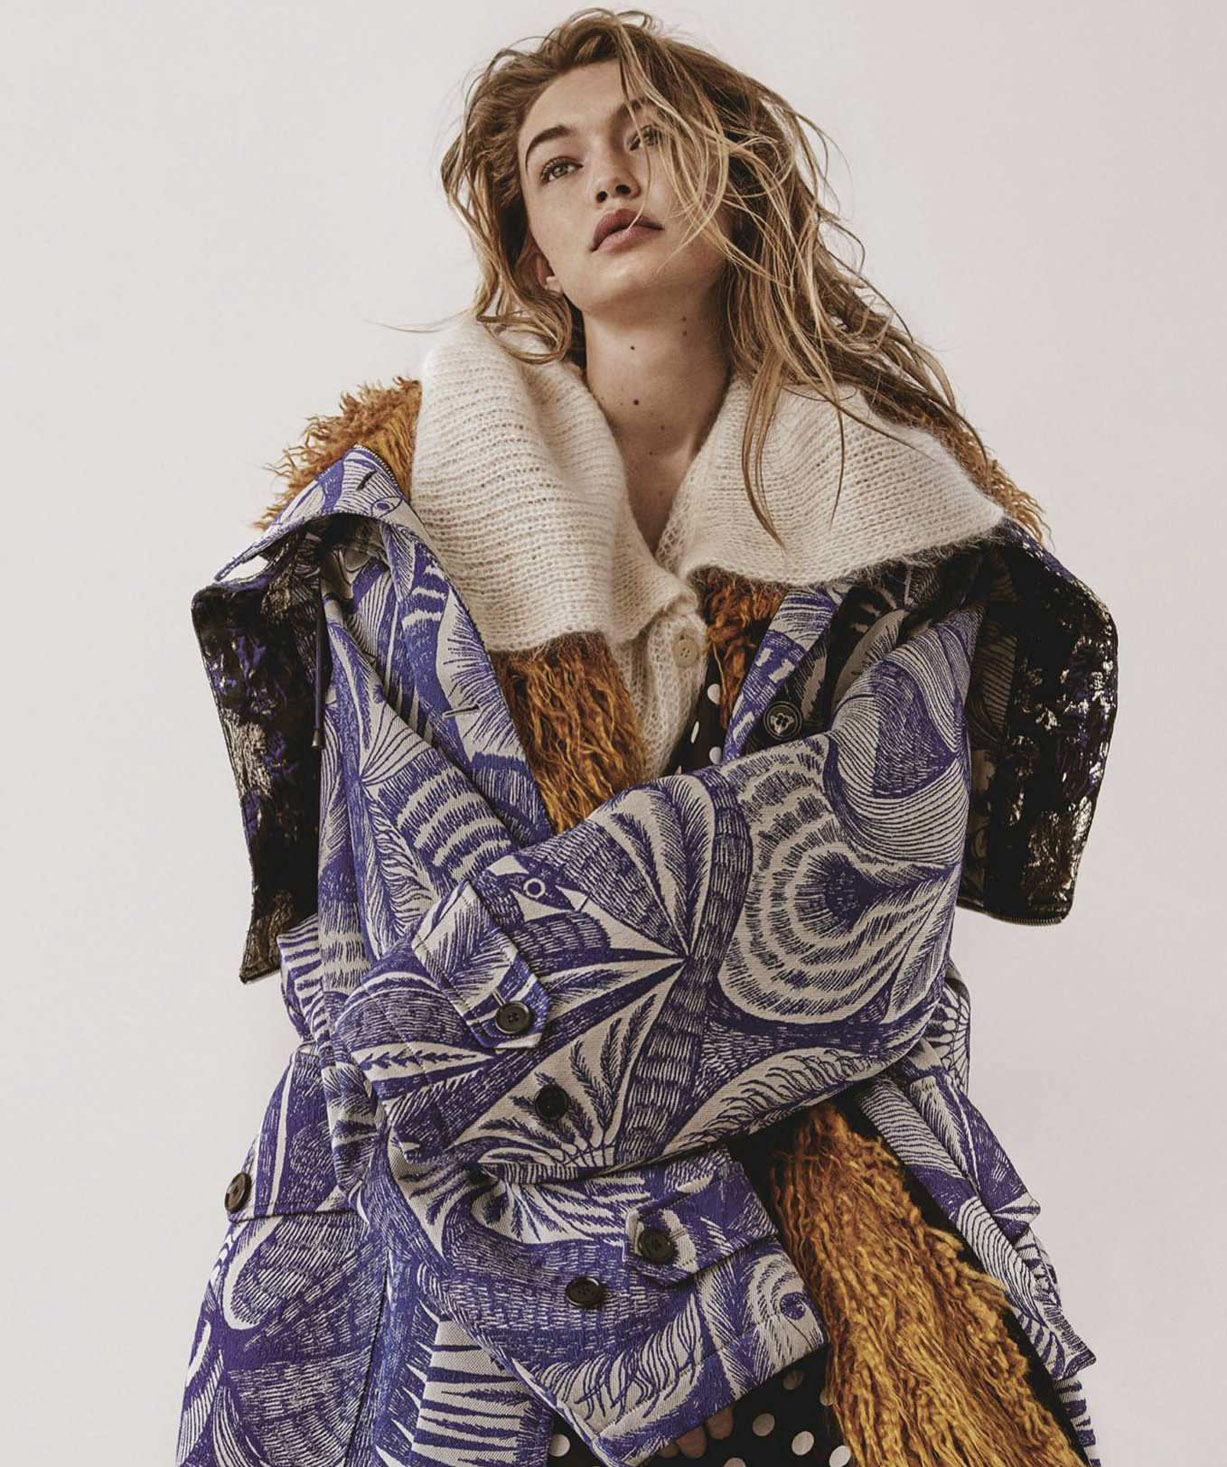 Cool Change / Gigi Hadid by Giampaolo Sgura / Vogue Australia july 2018